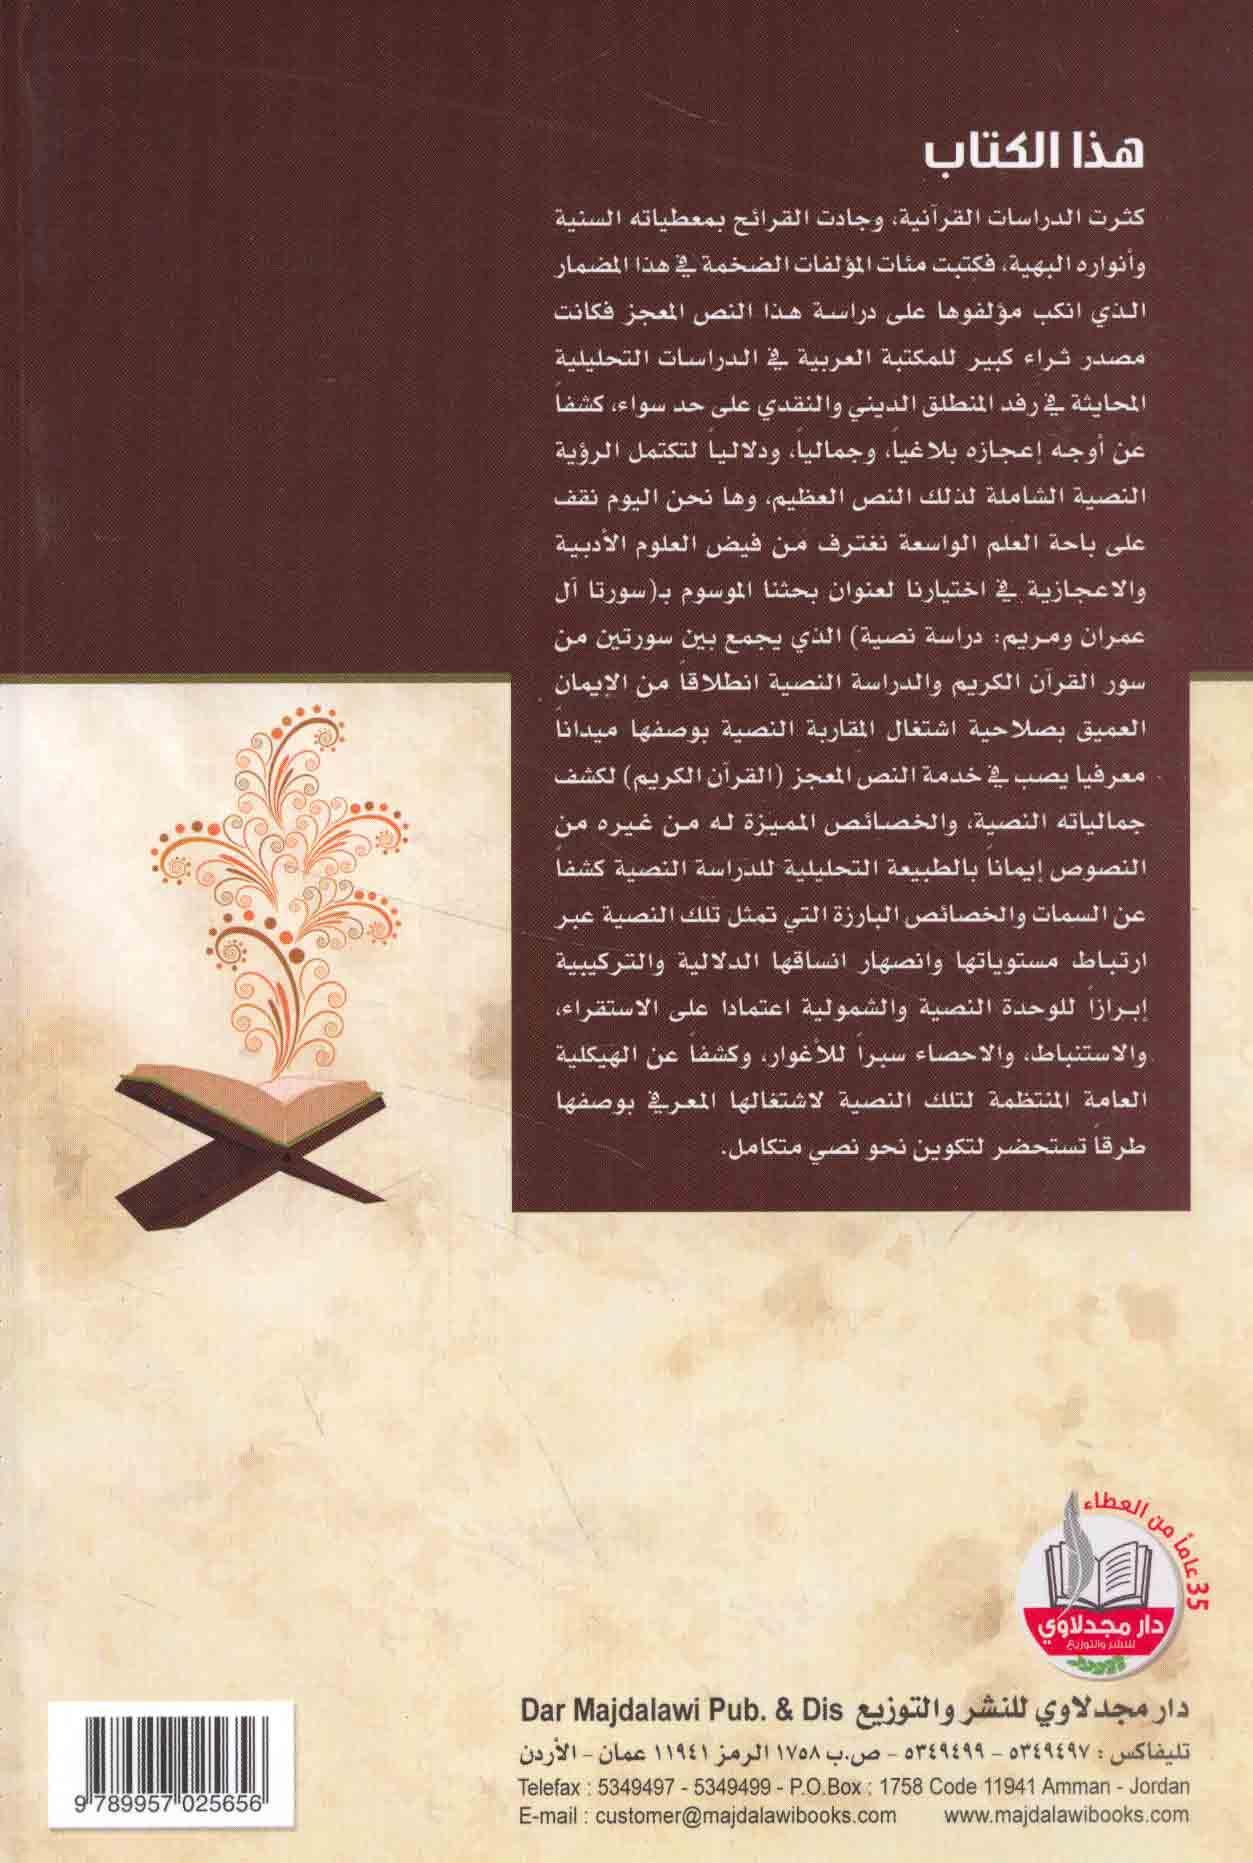 Maryam Flower In Arabic - Flowers Healthy